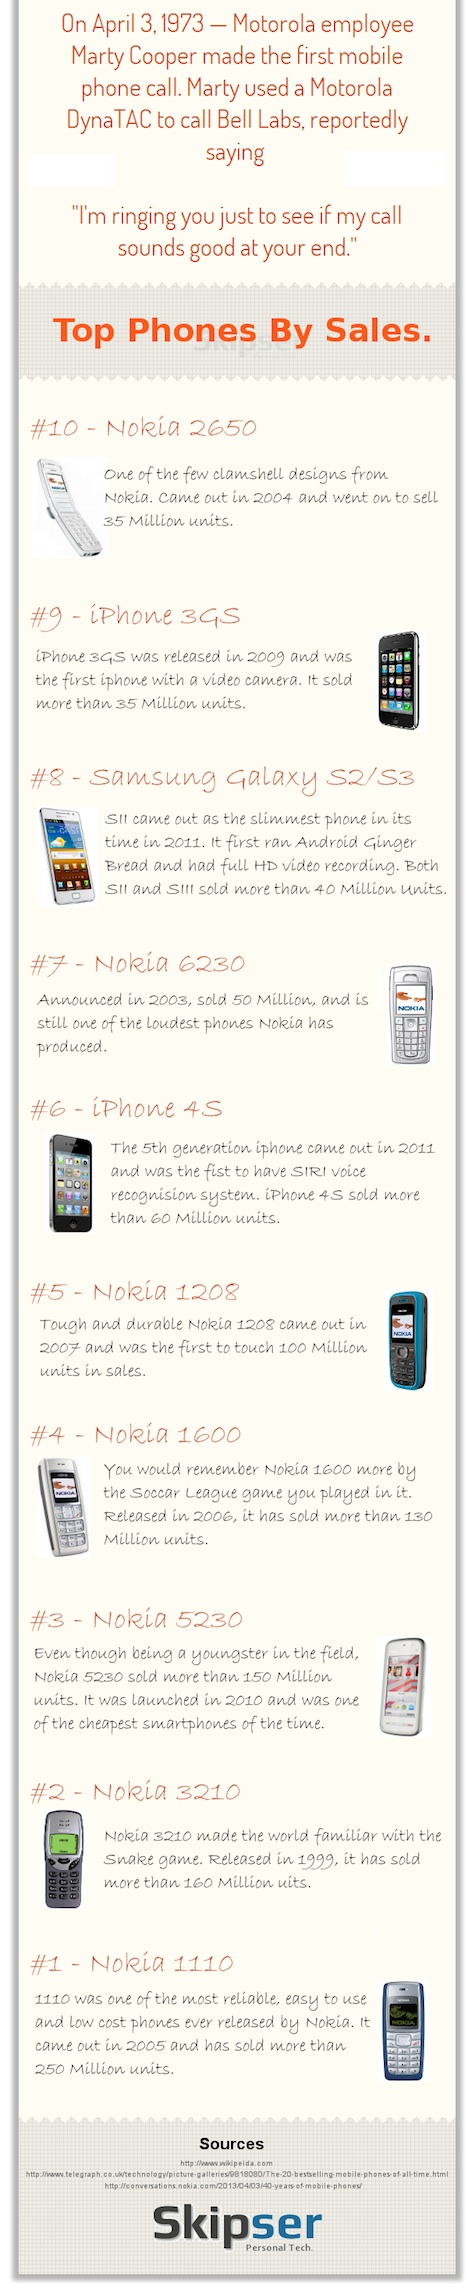 verkaufte_phones2